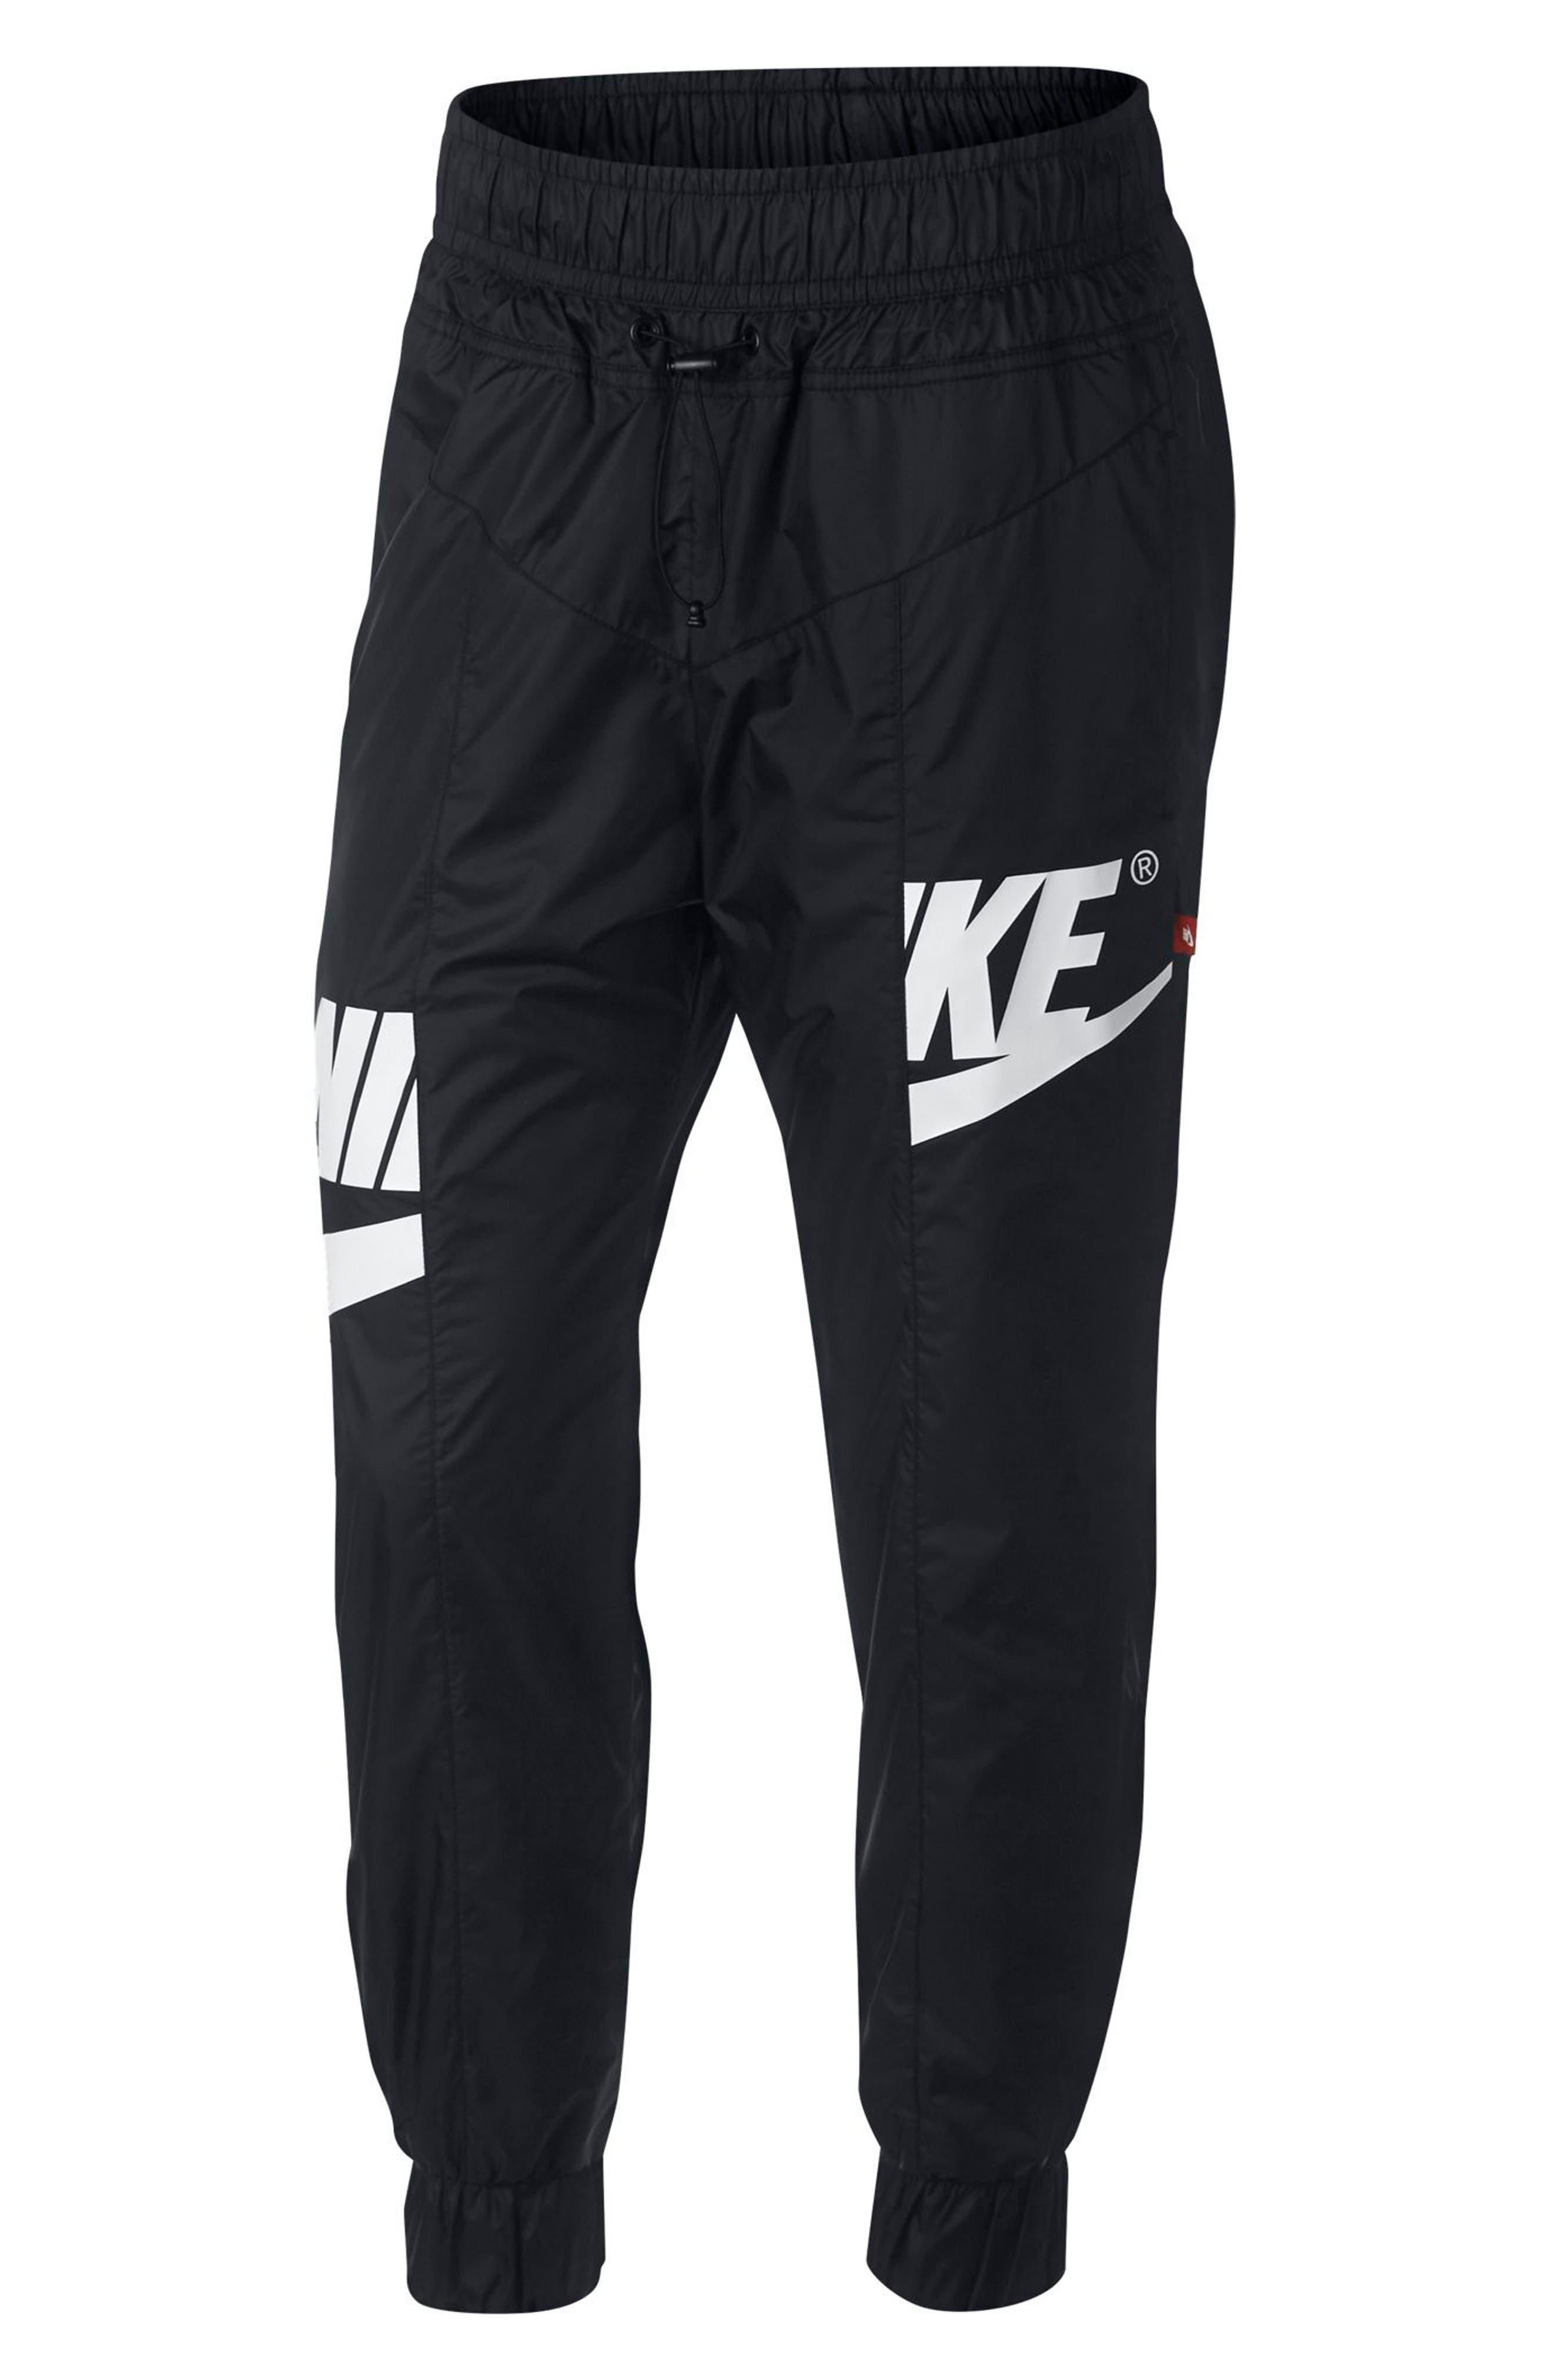 Sportswear Windrunner Women's Pants,                         Main,                         color, Black/ Black/ Obsidian/ White